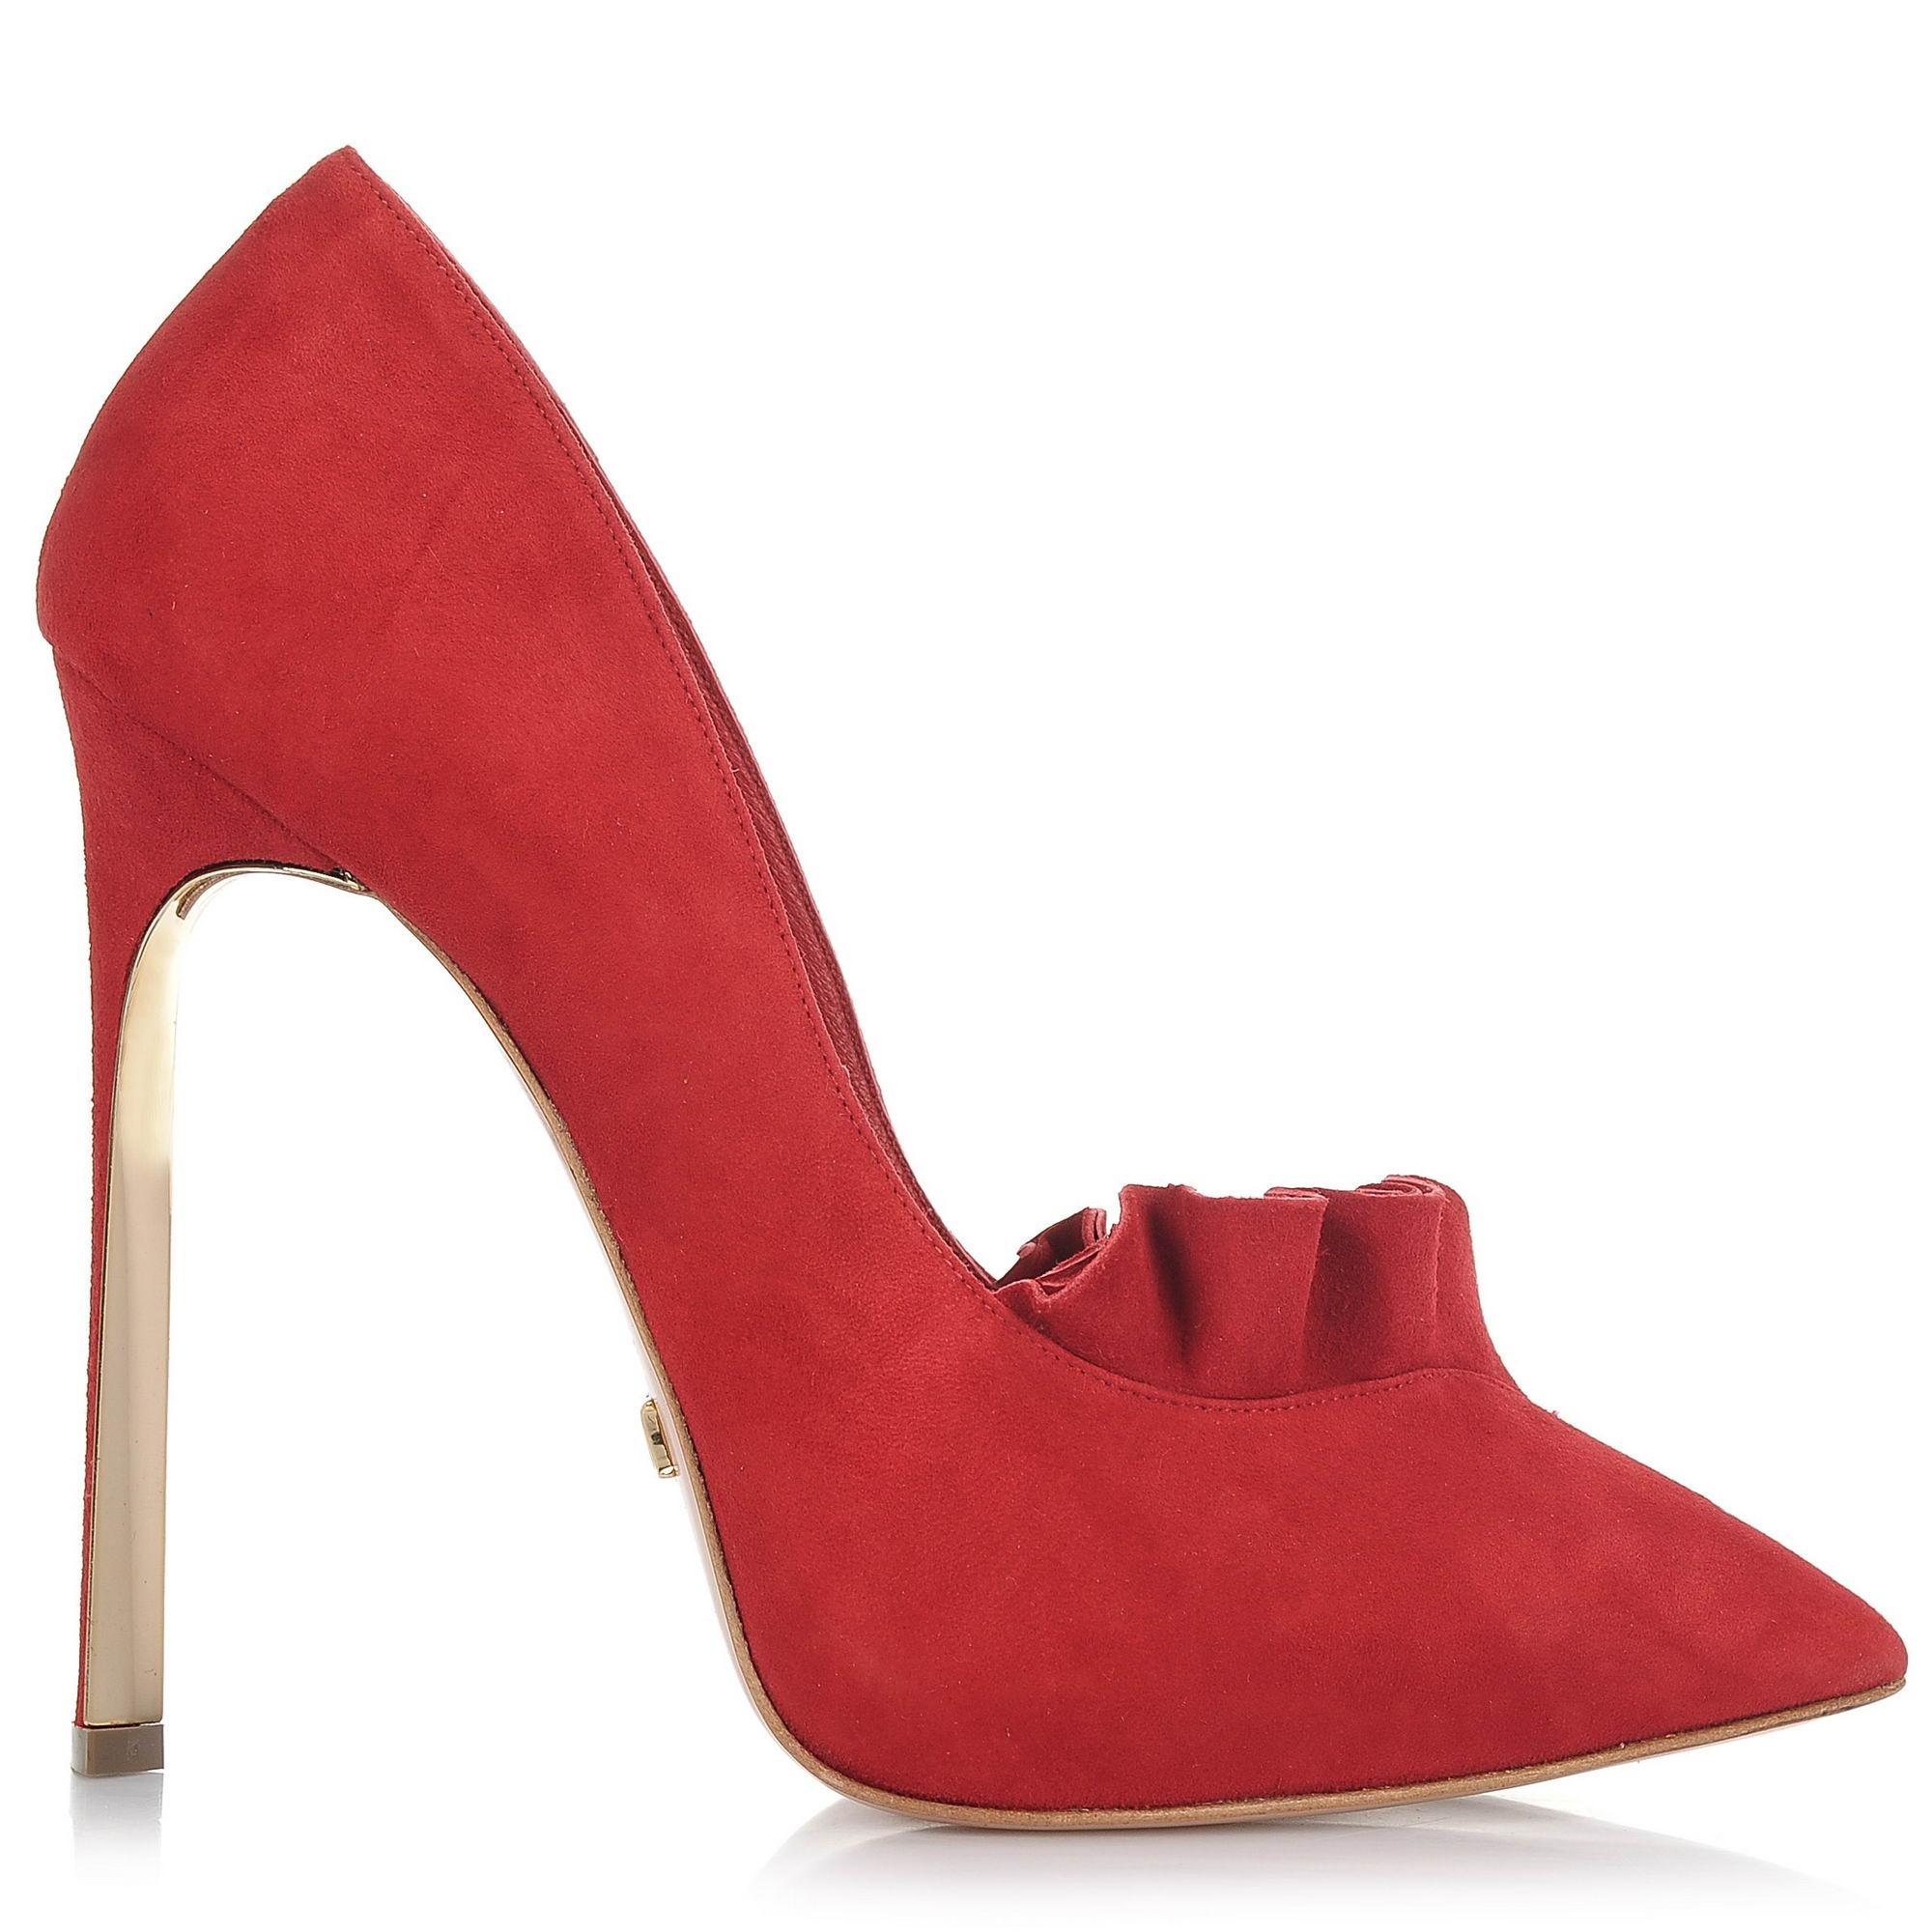 Suede Δερμάτινες Γόβες Dukas Twist Pump Vollant 2.DTV γυναικα   γυναικείο παπούτσι